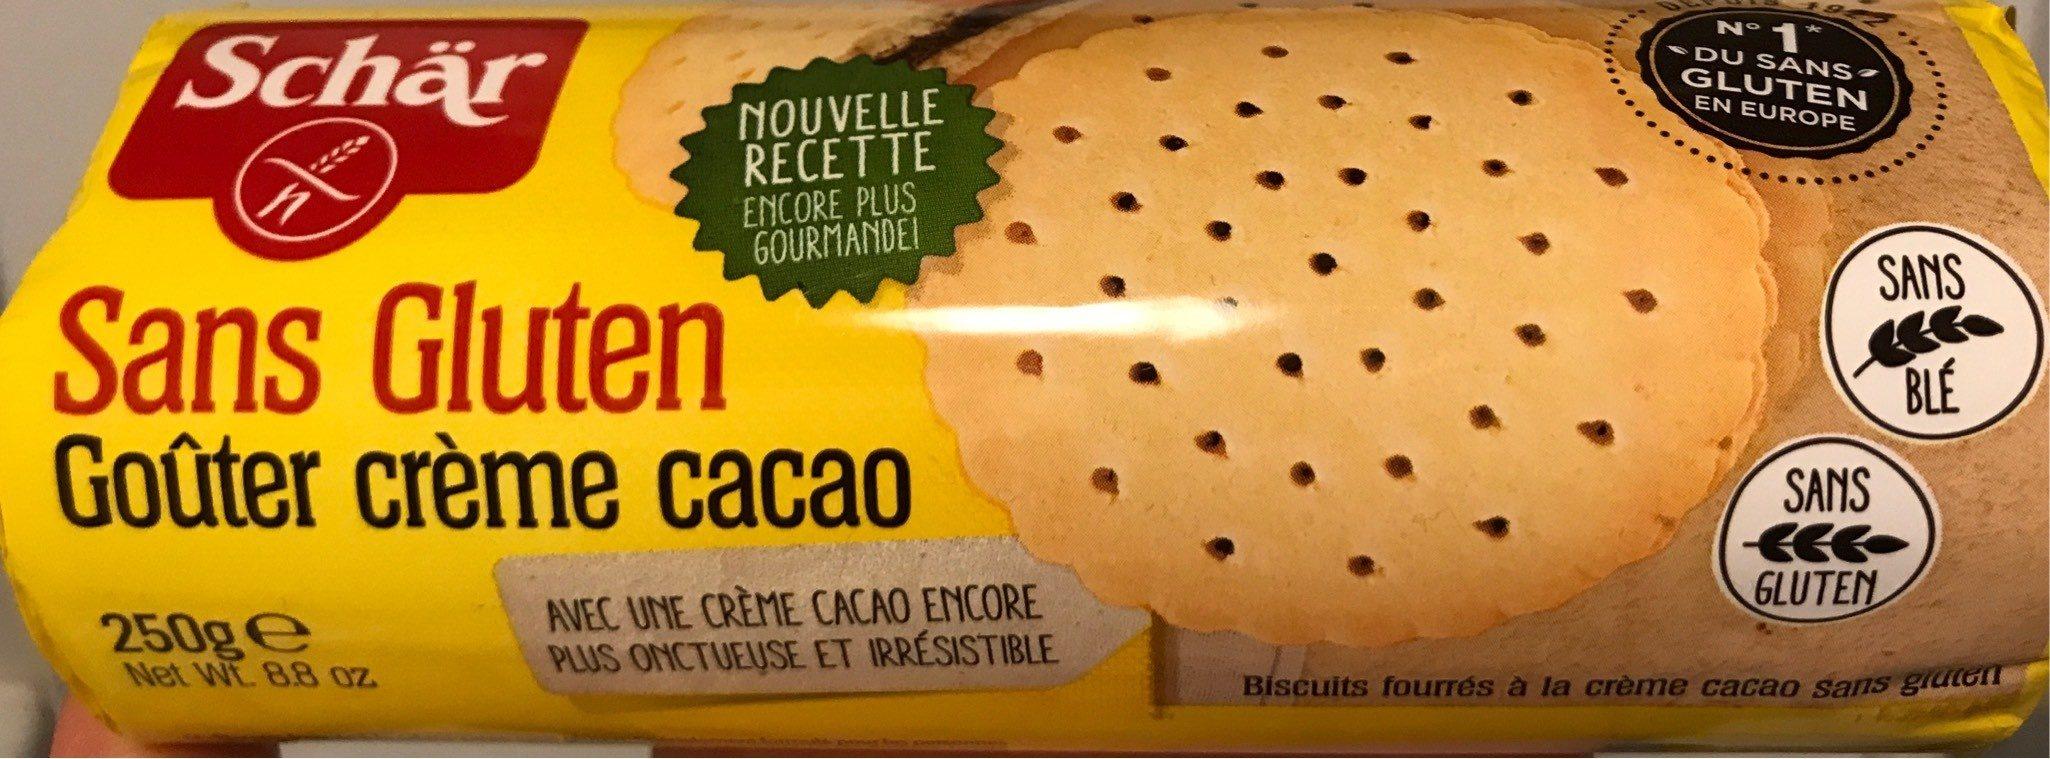 Gouter creme cacao sans gluten - Produkt - fr